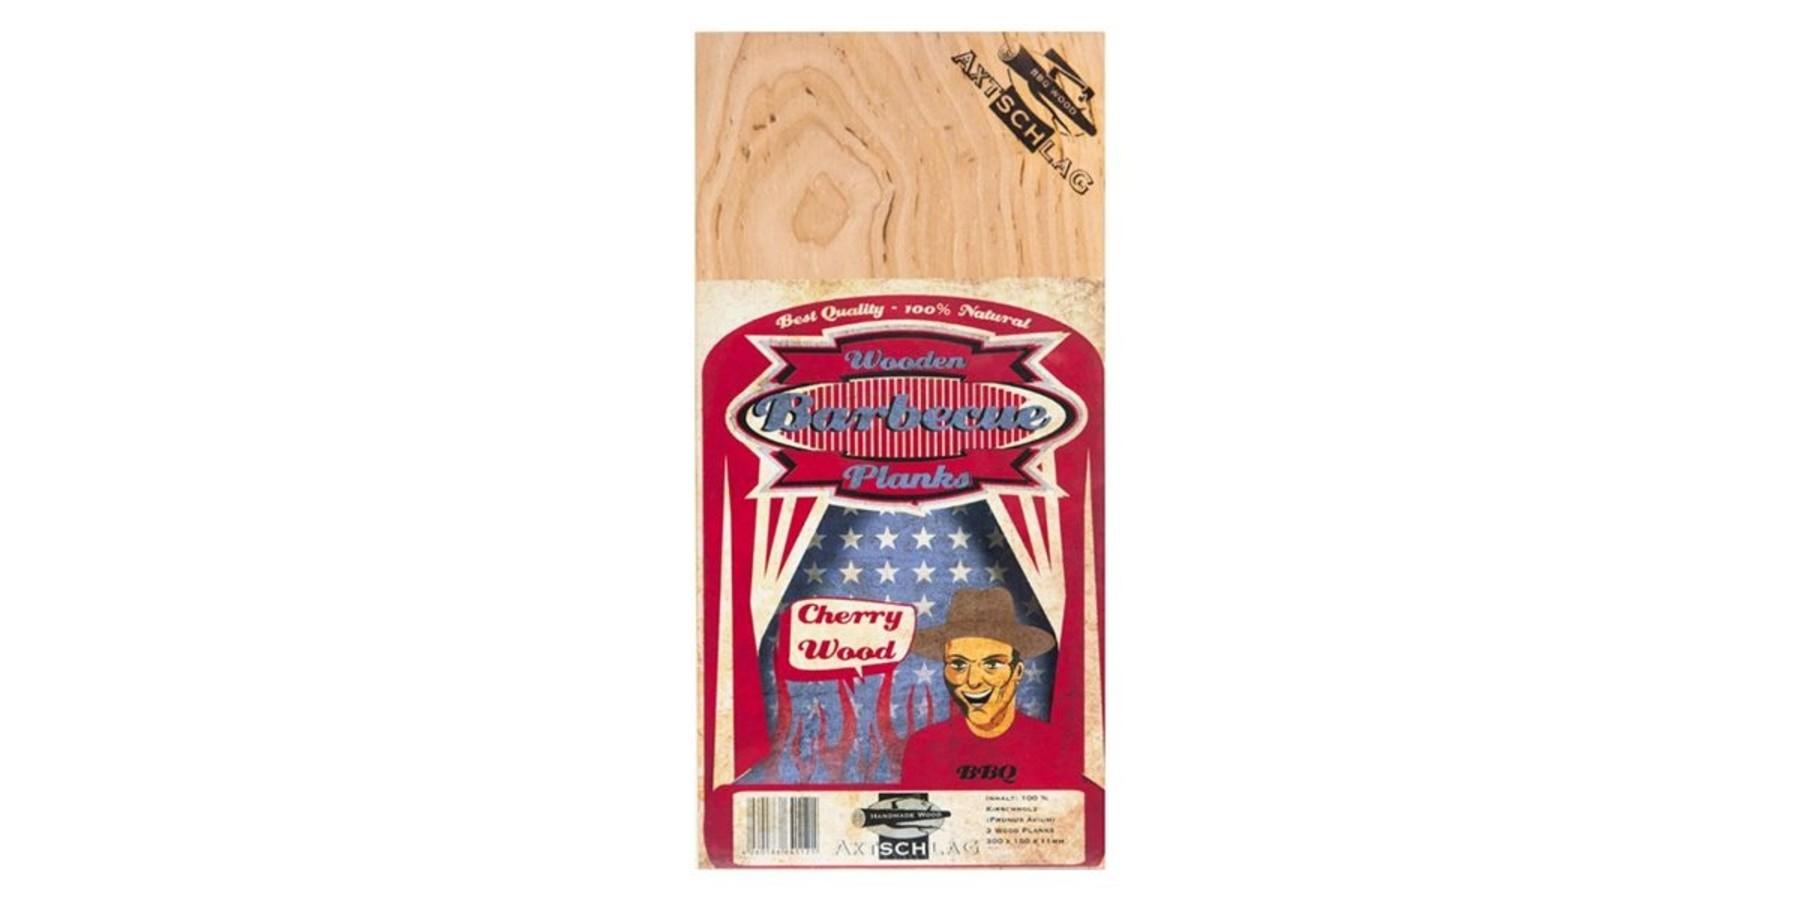 Cherry wooden planks